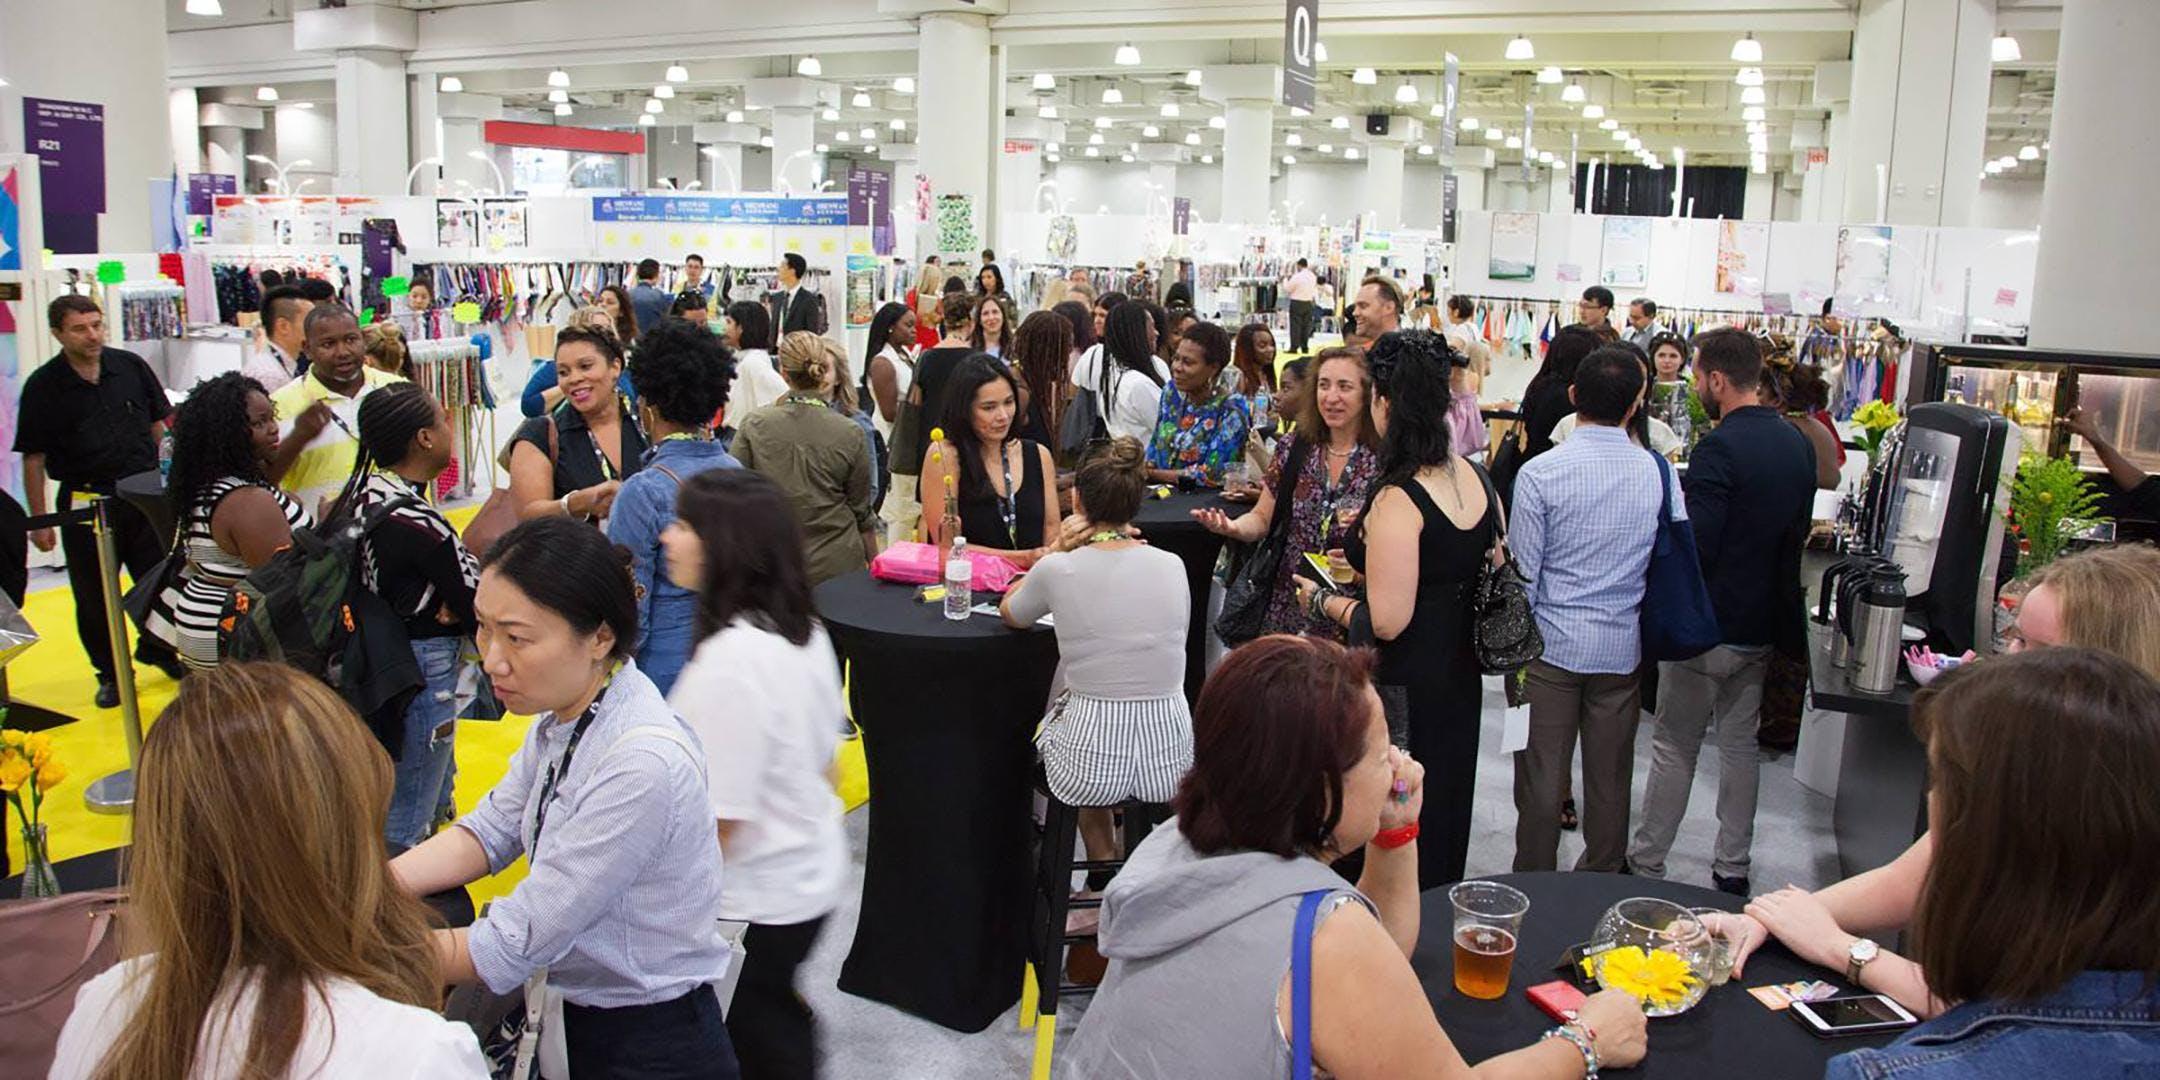 Texworld Usa X Startup Fashion Designer Meetup 24 Jul 2018